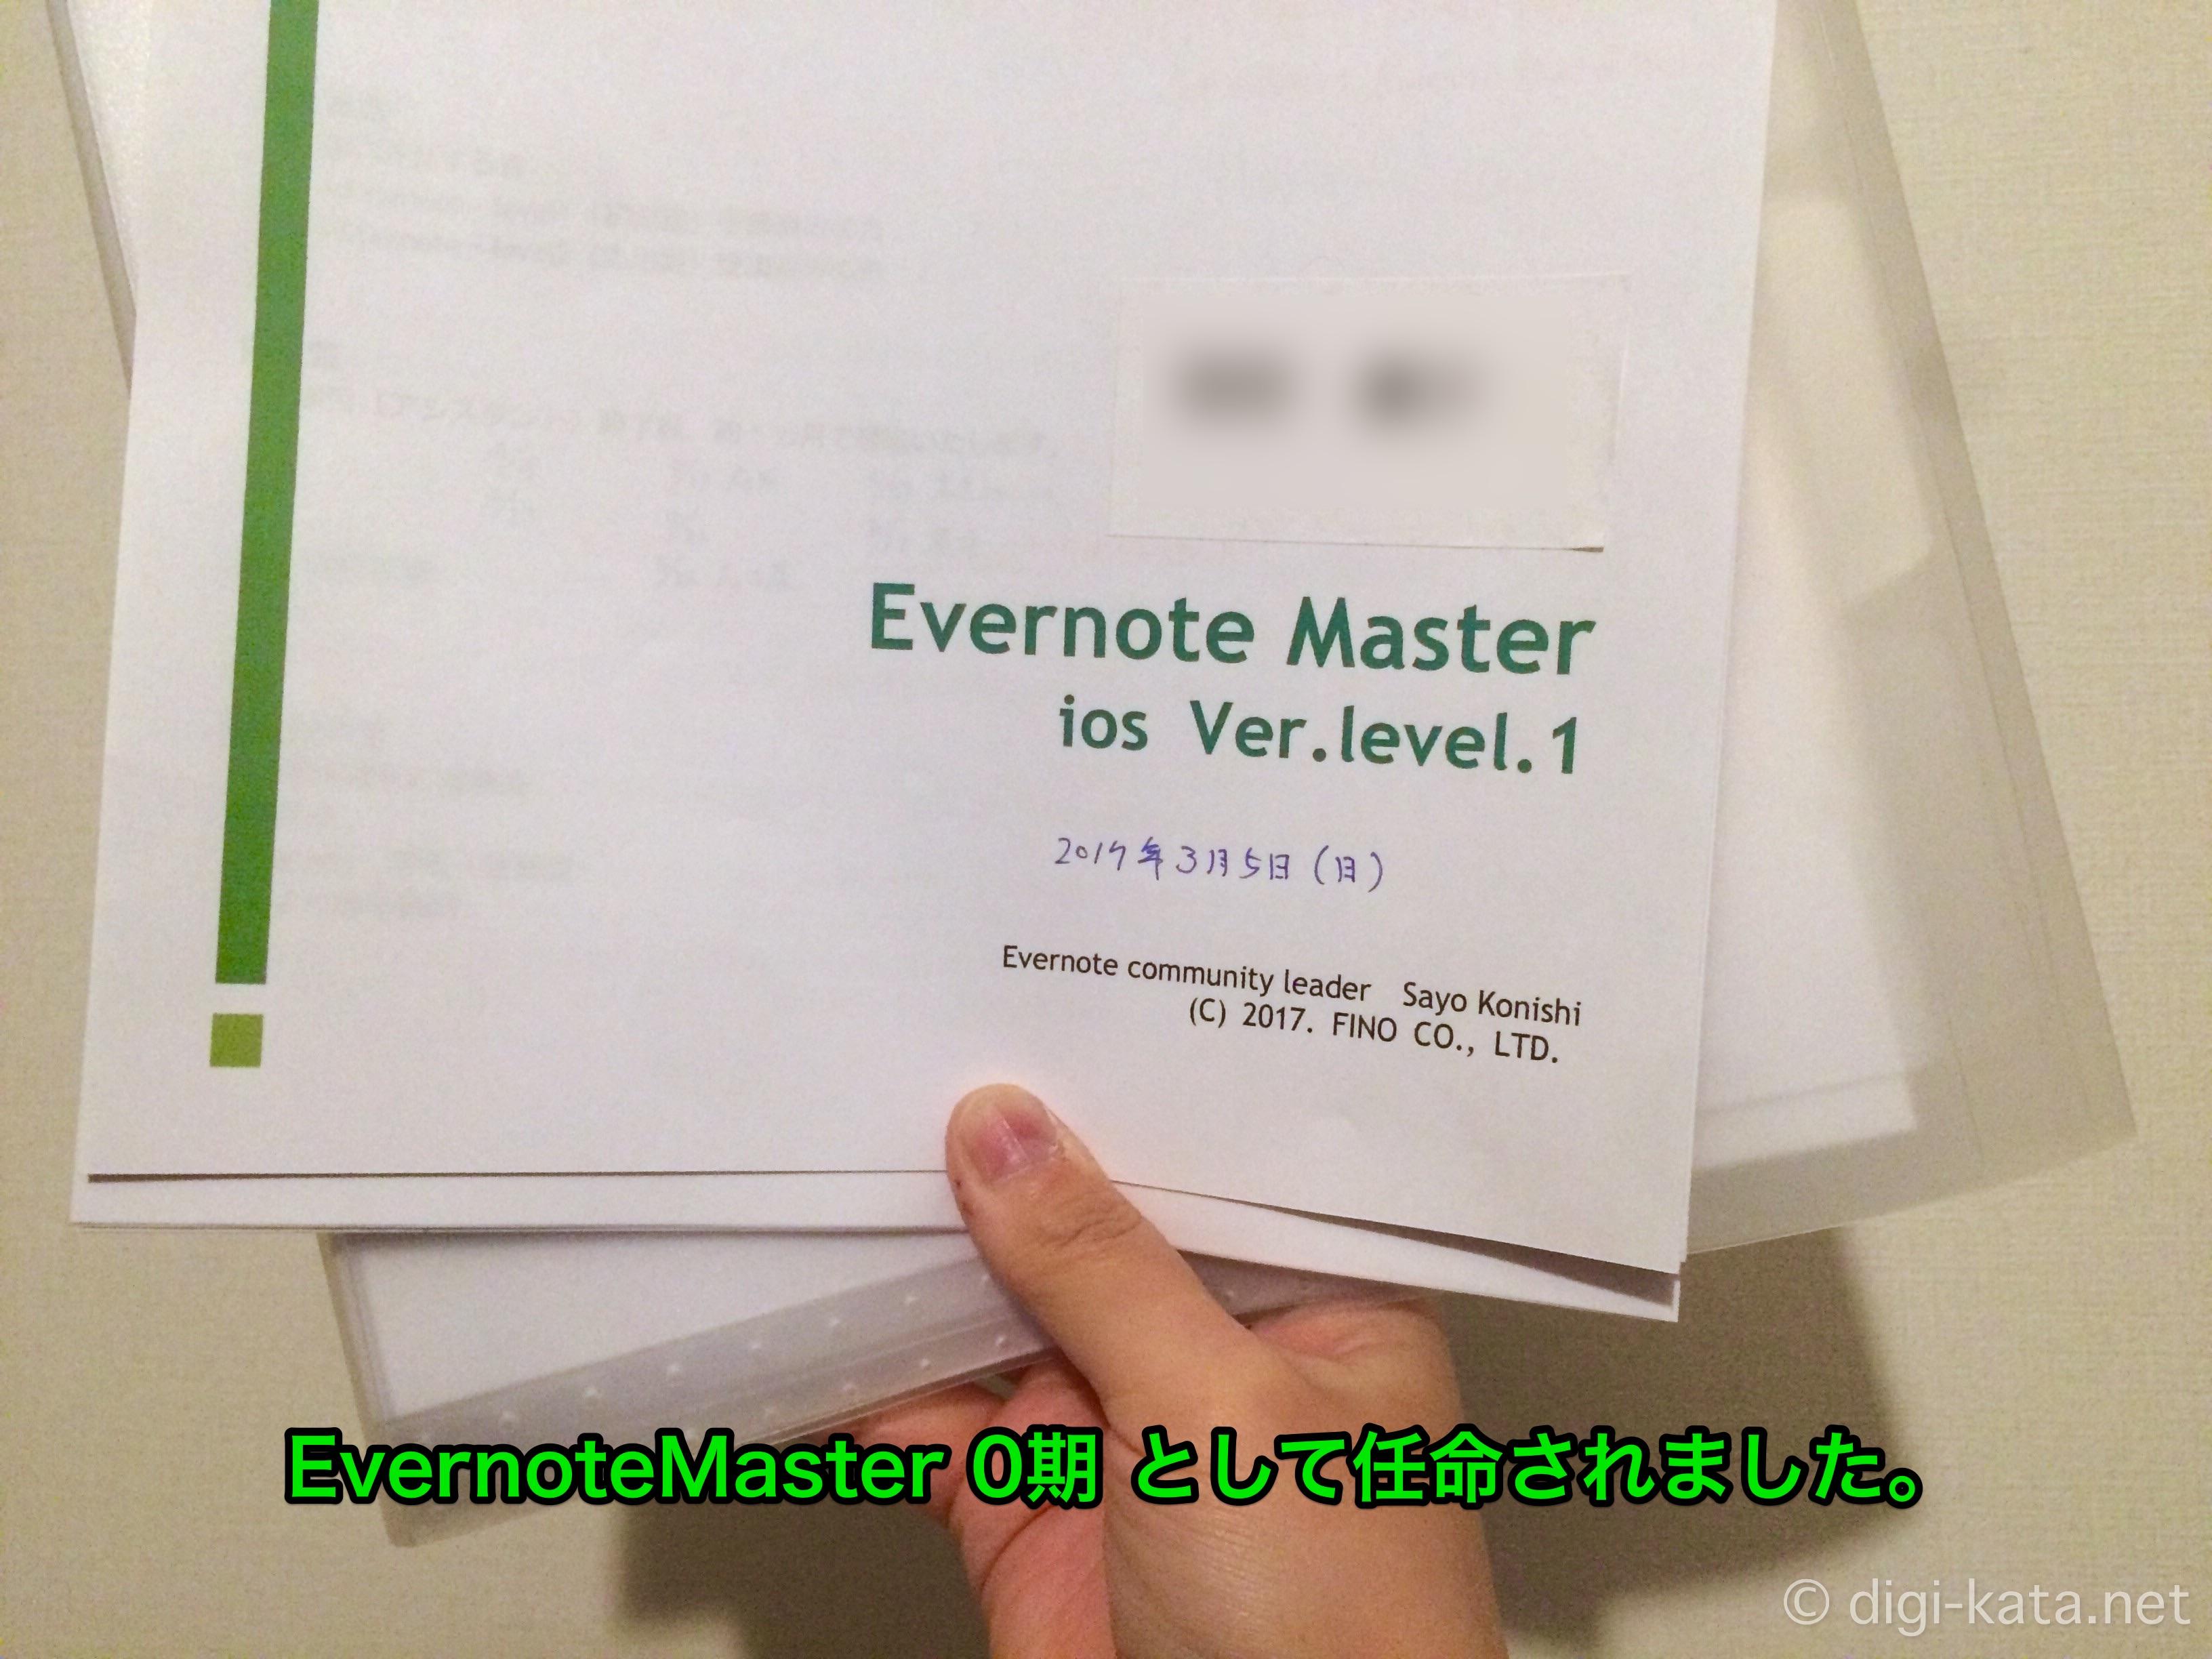 EvernoteMaster0期として任命されました